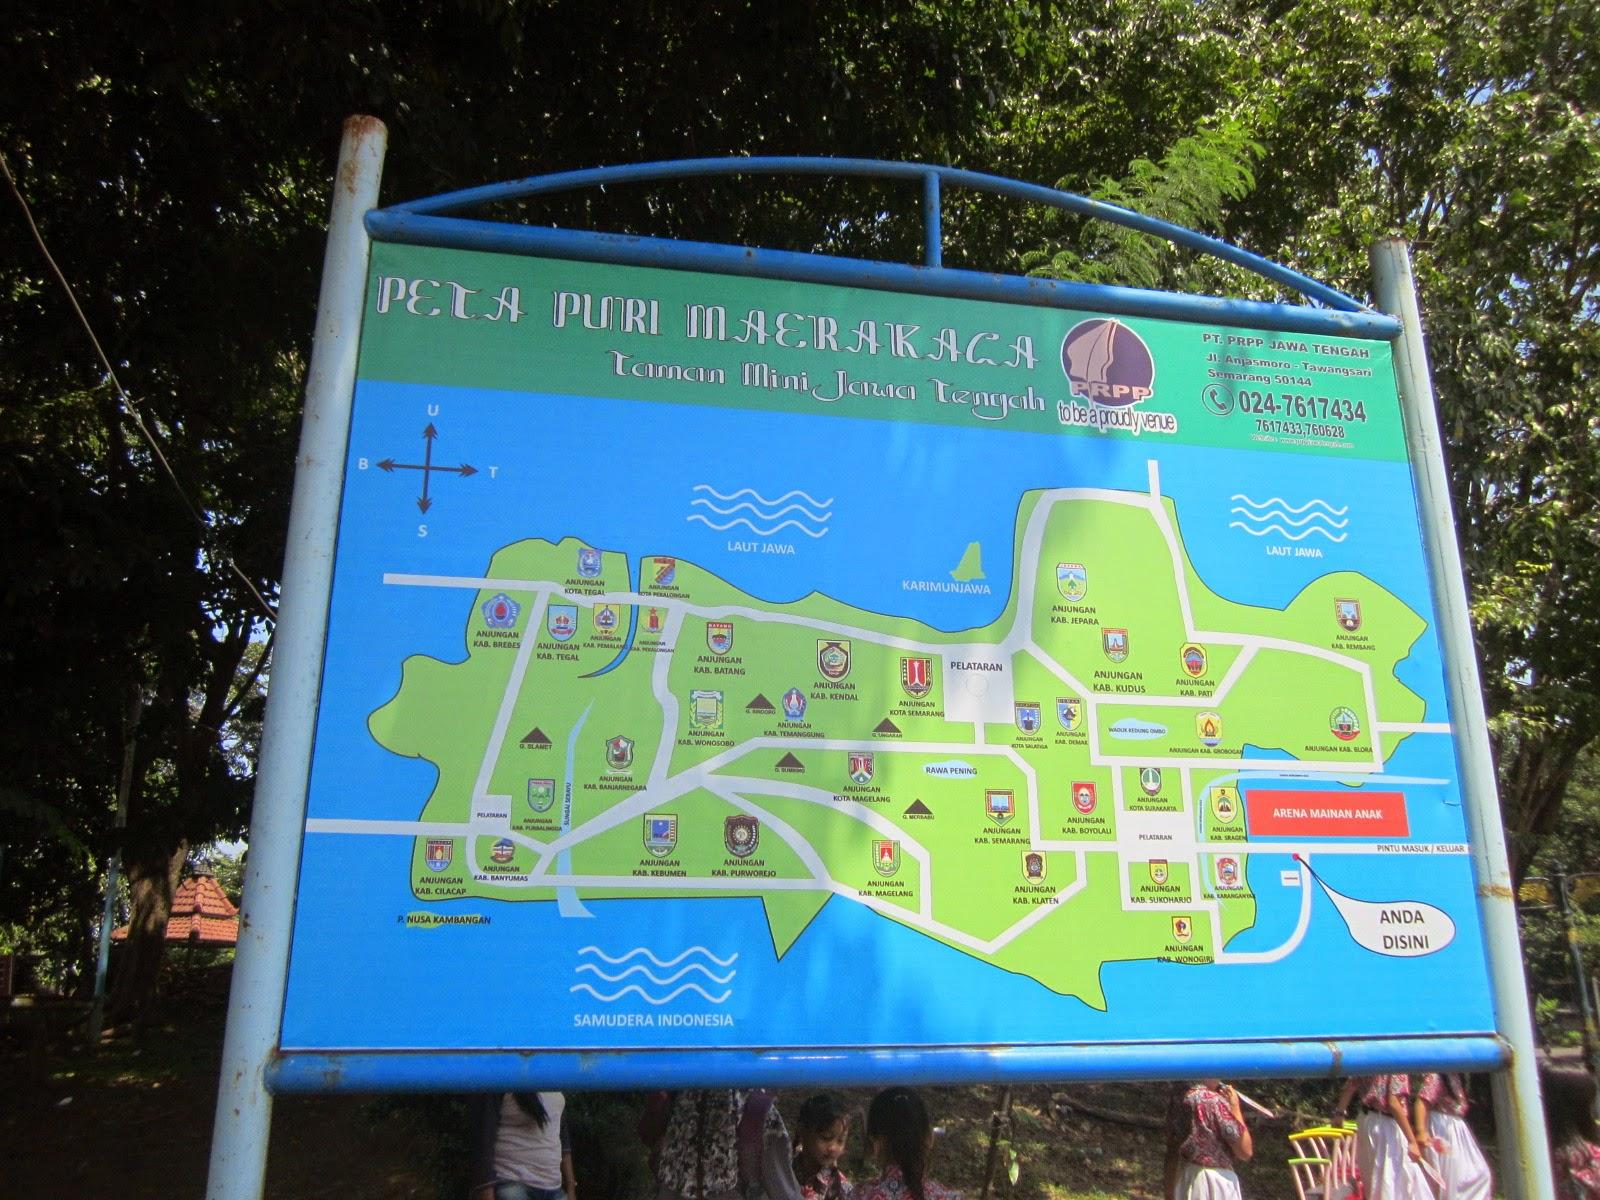 Puri Maerakaca Taman Mini Jawa Tengah Terhitsss Di Semarang Cakrawala Tour Wisata